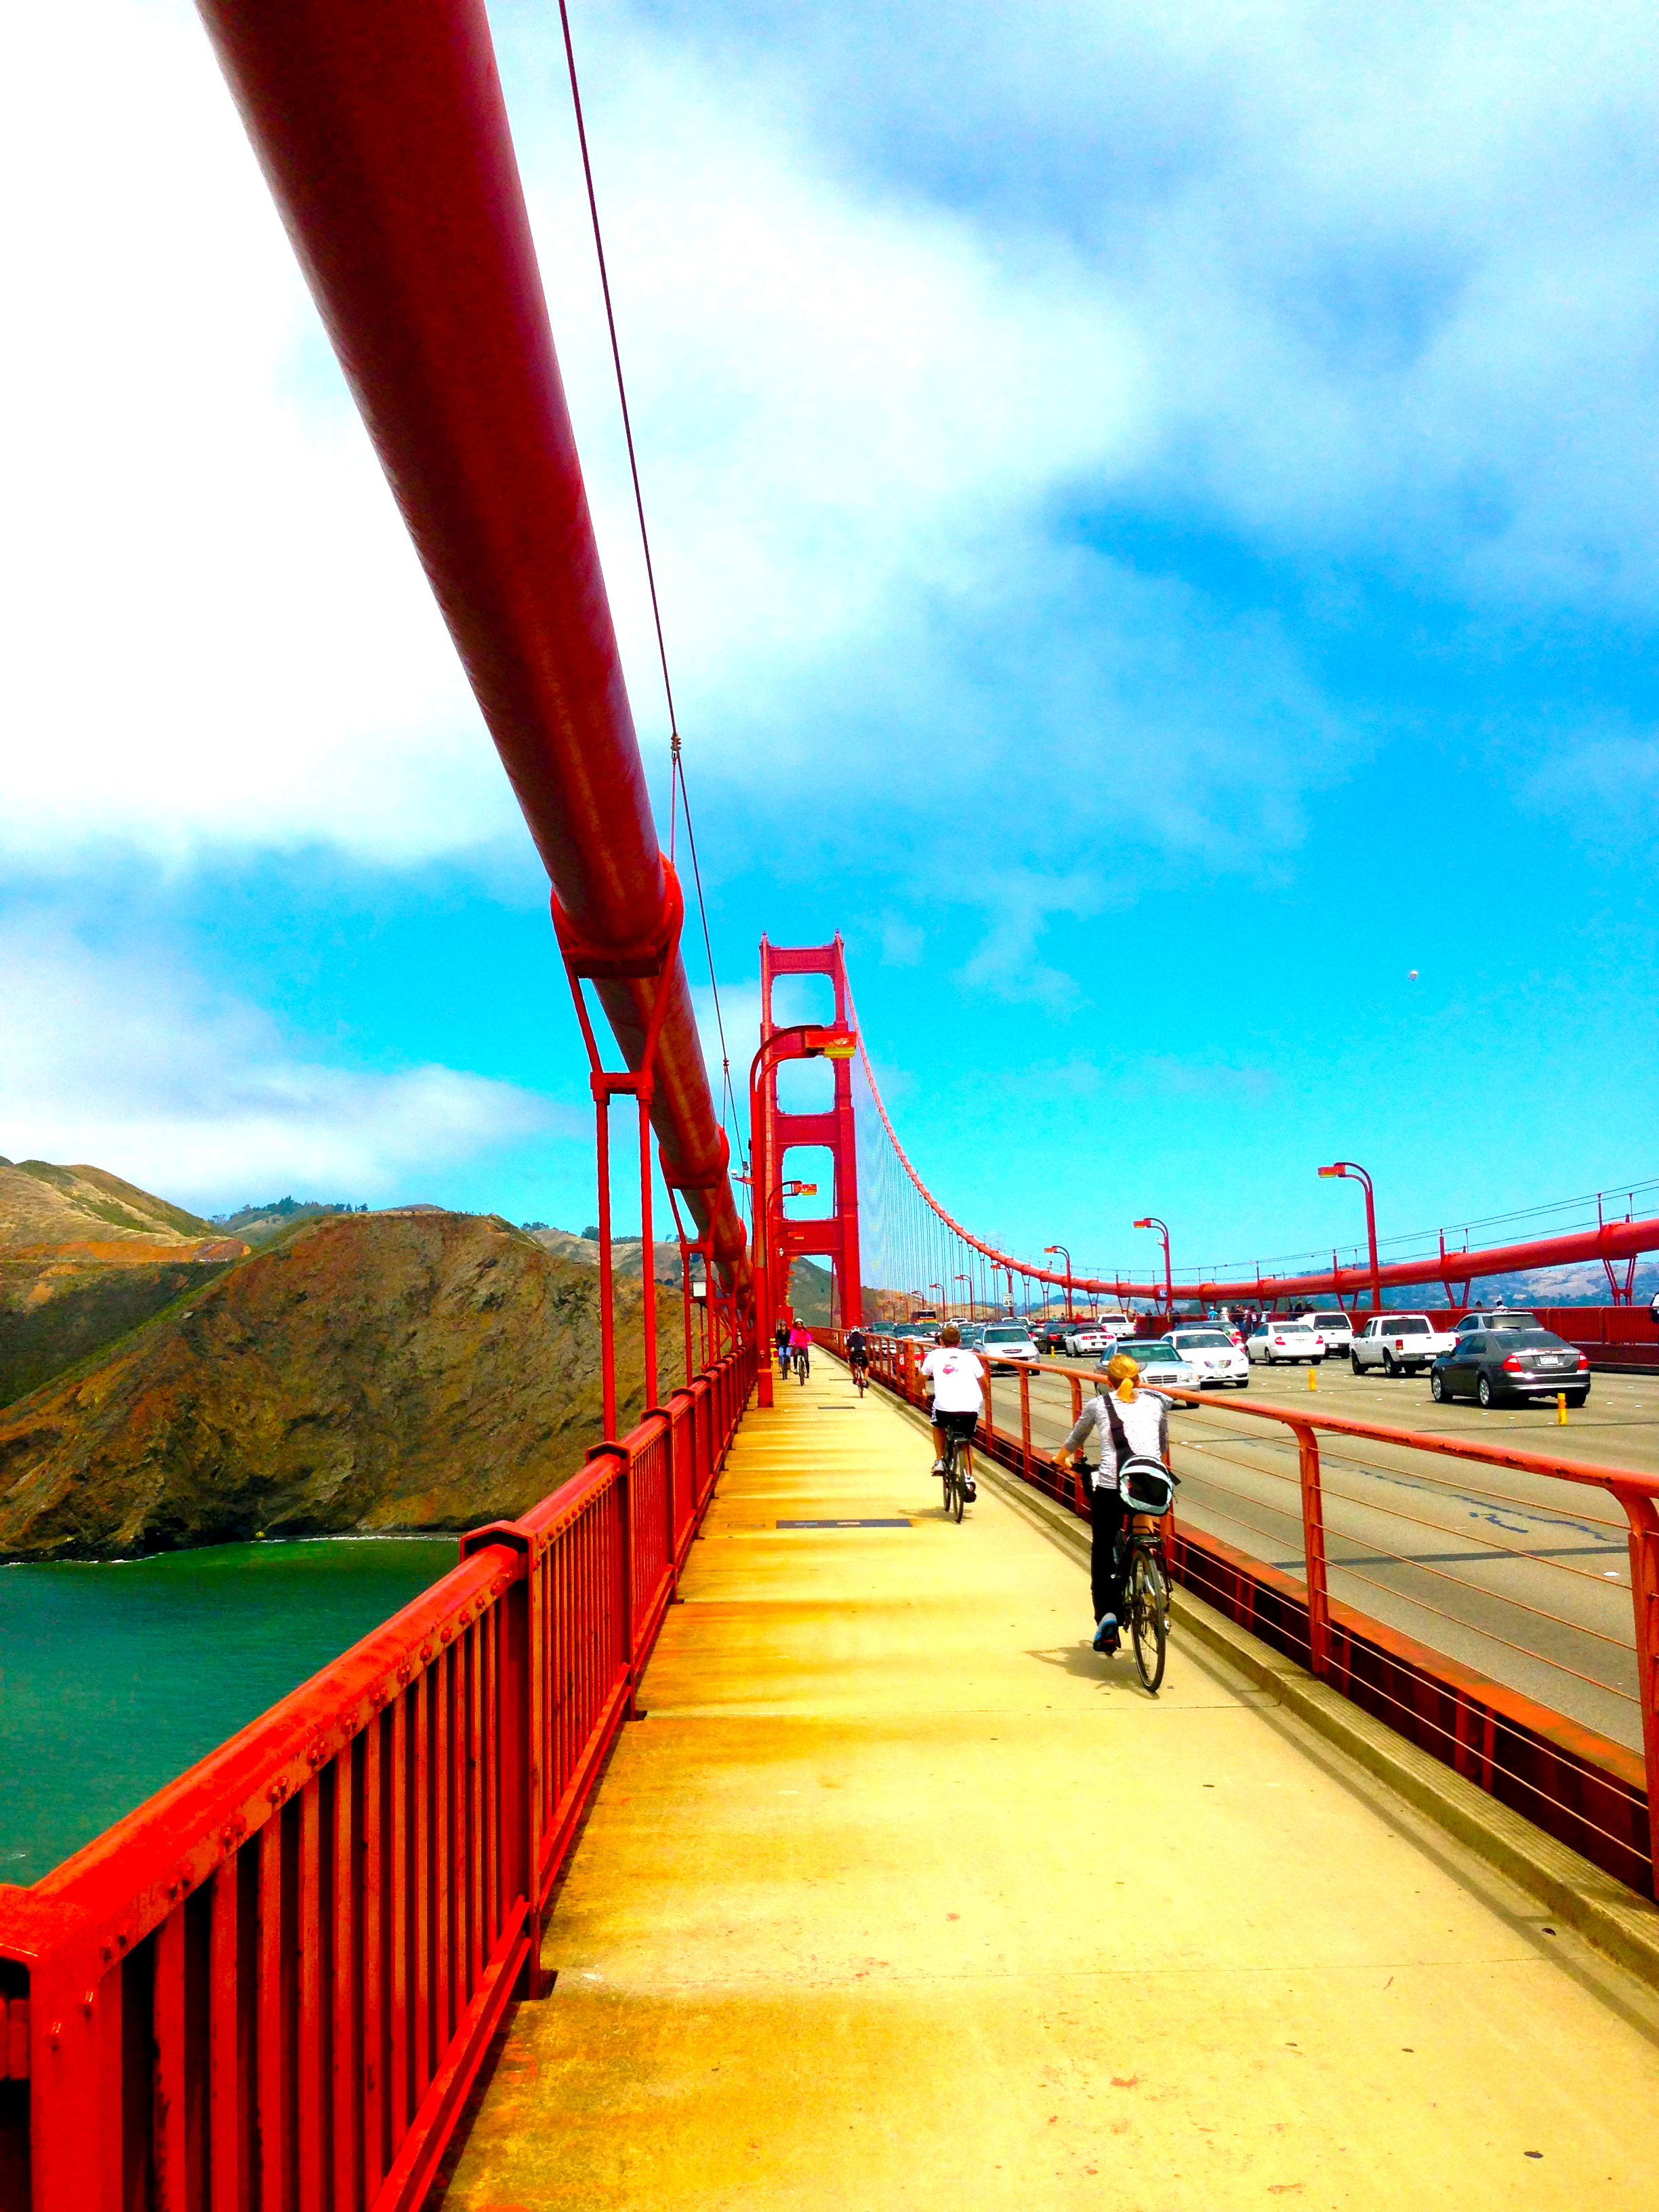 San Francisco To Tiburon Biking The Golden Gate Jetset